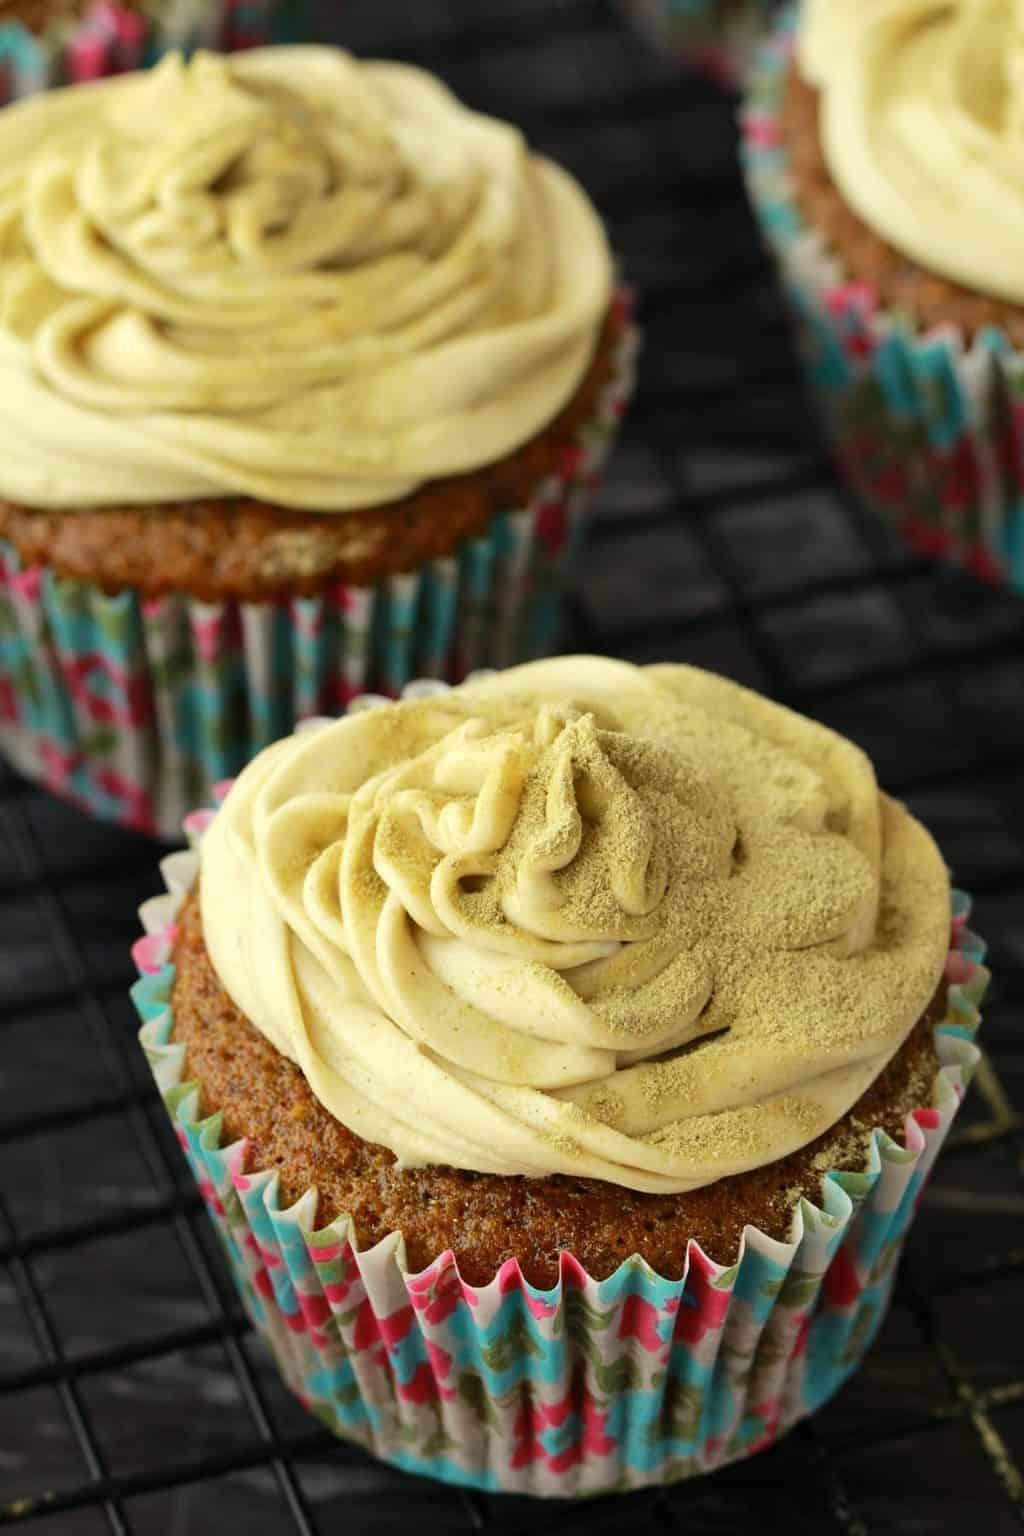 Vegan Matcha Green Tea Cupcakes with Velvety Matcha Green Tea Frosting! Moist, fluffy and delicious! #vegan #lovingitvegan #cupcakes #matcha #dessert